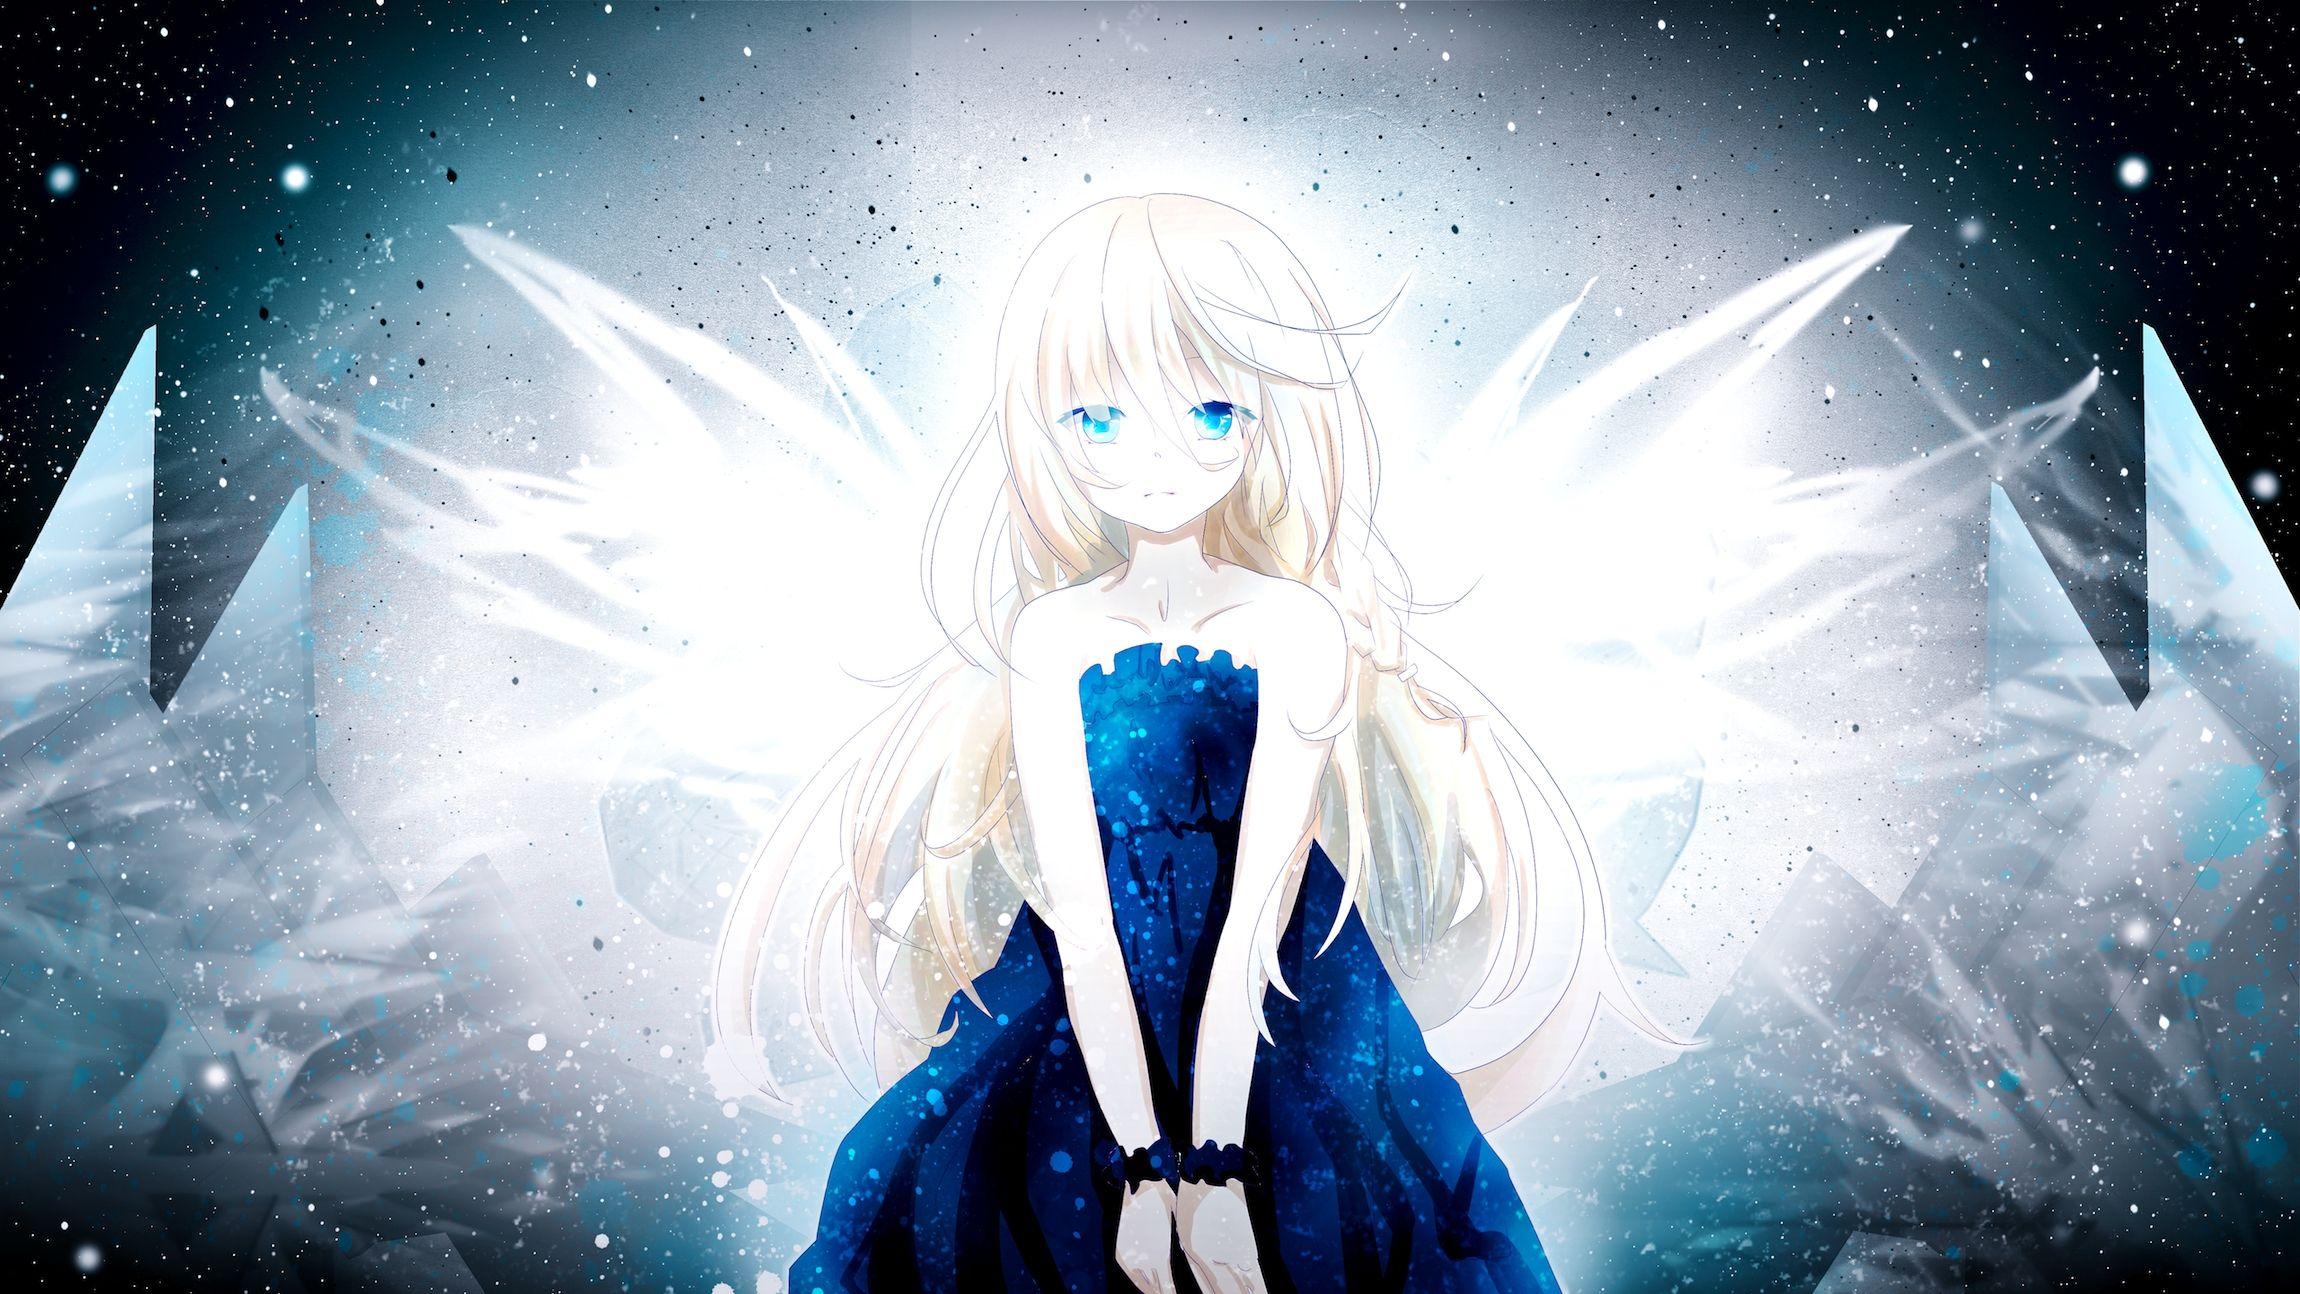 Blonde Hair Blue Eyes Dress Ia Long Hair Suzuair Bellsuzu